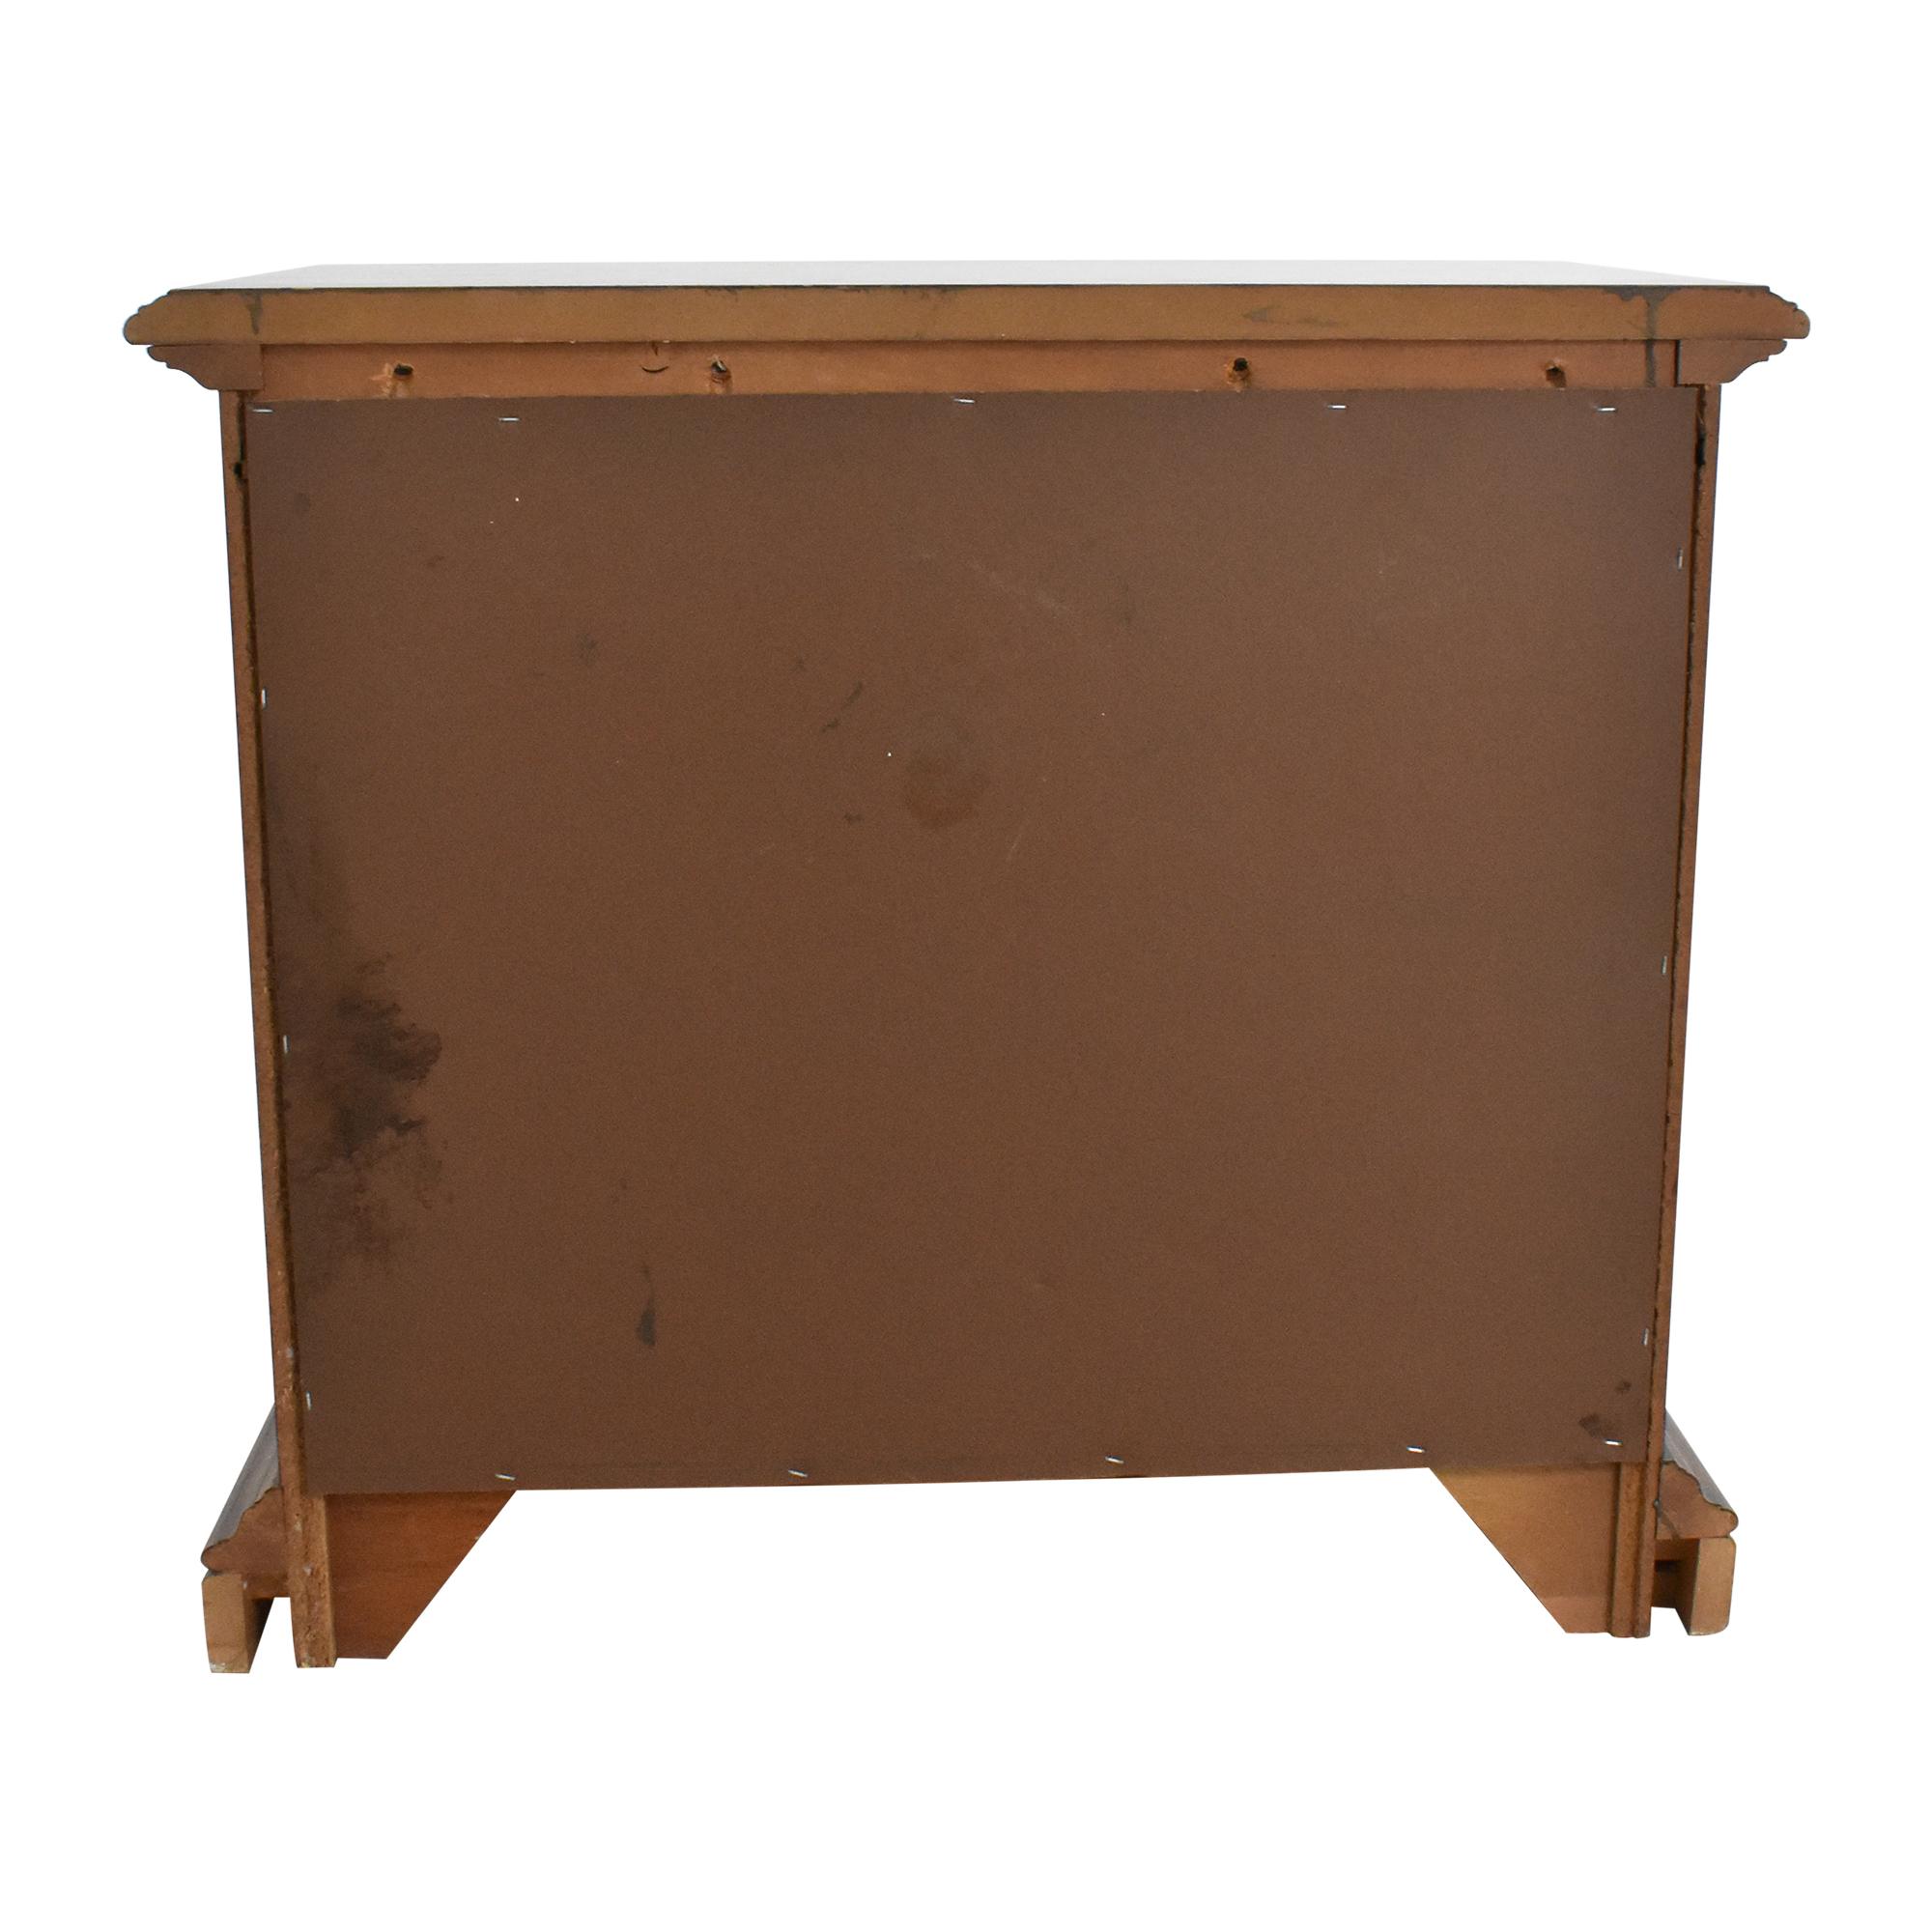 Stanley Furniture Stanley Furniture Cabinet Nightstand dimensions